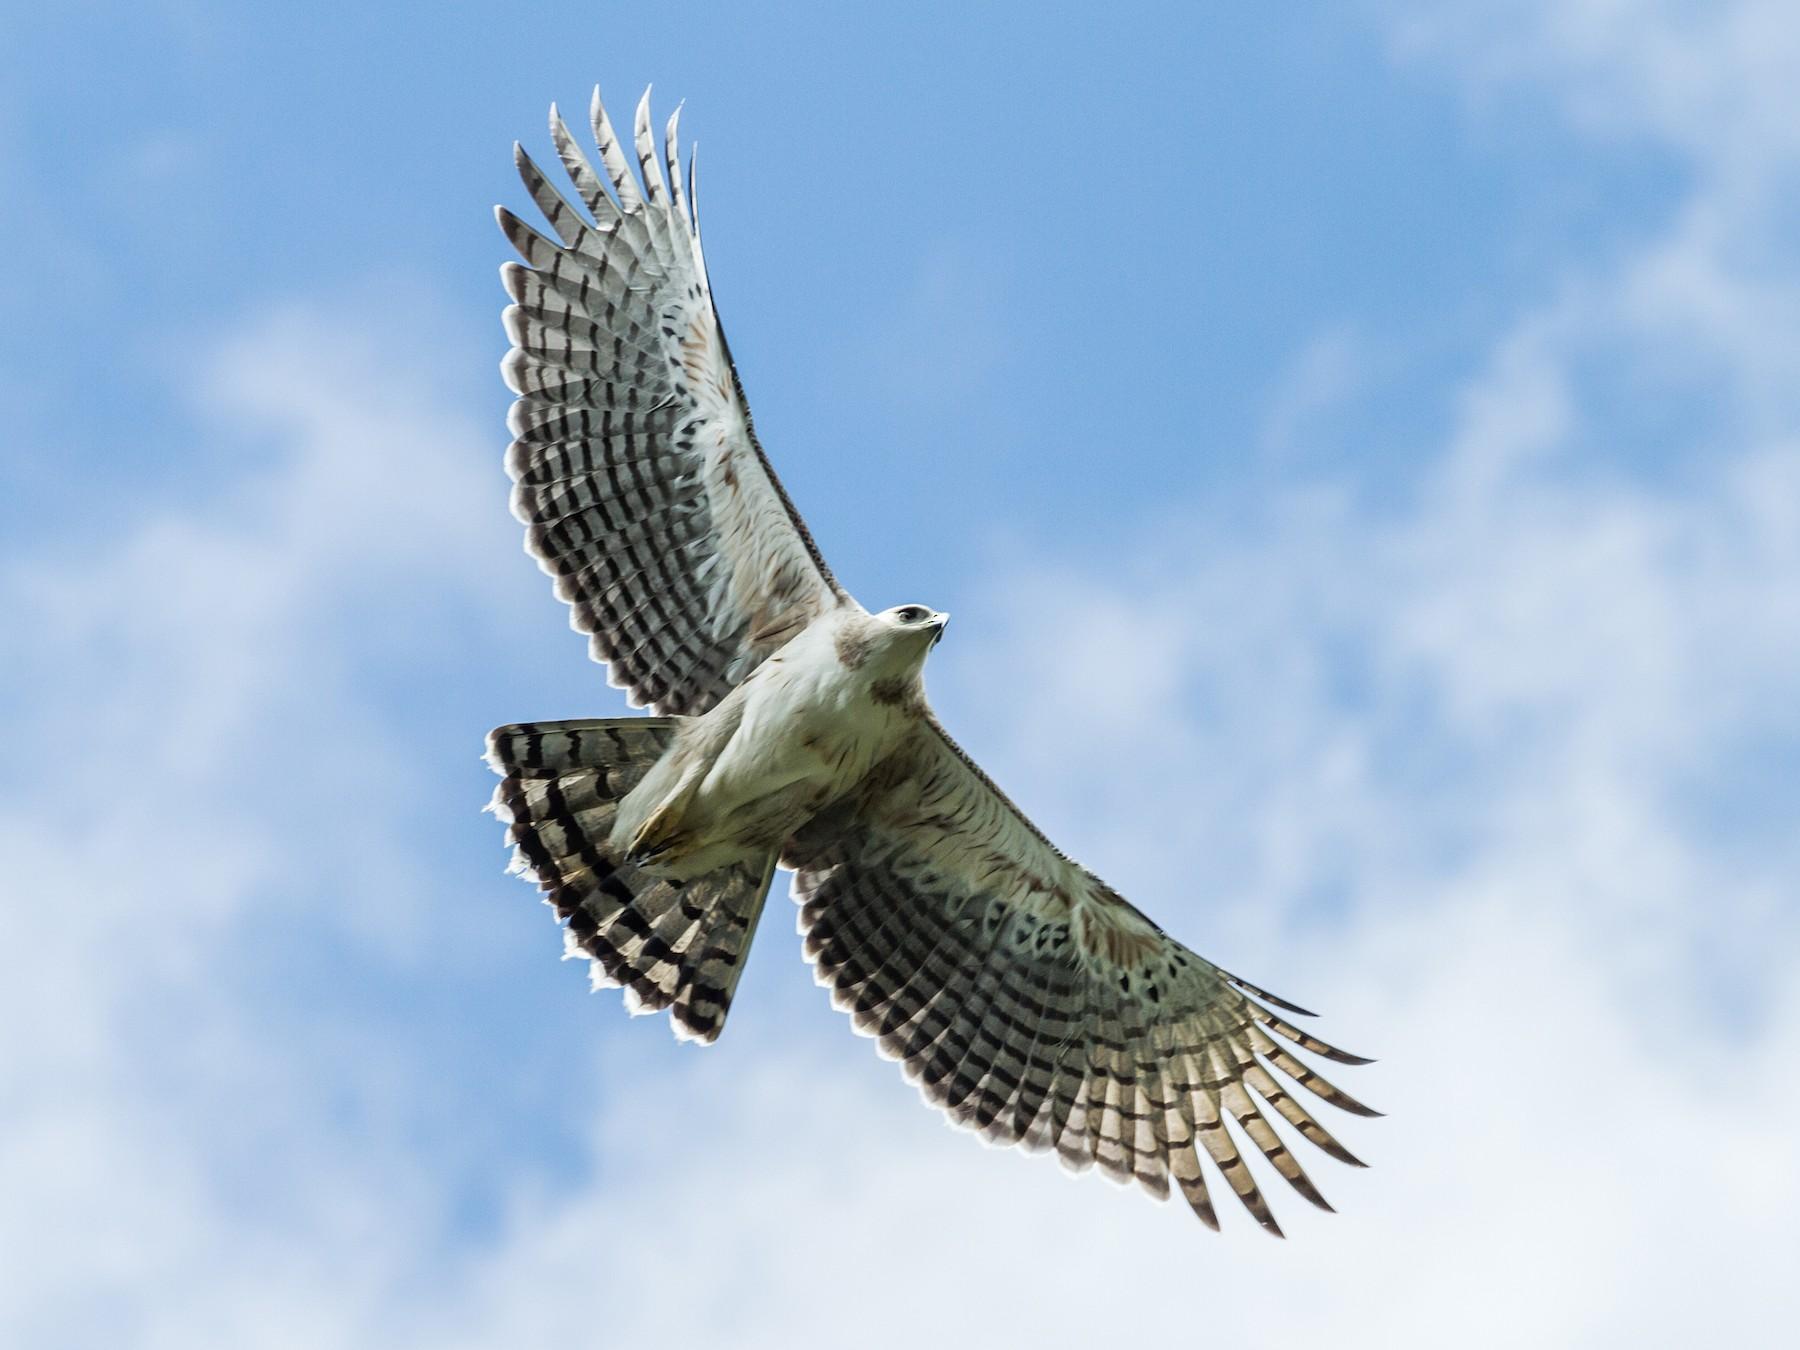 Black-and-chestnut Eagle - Nick Athanas